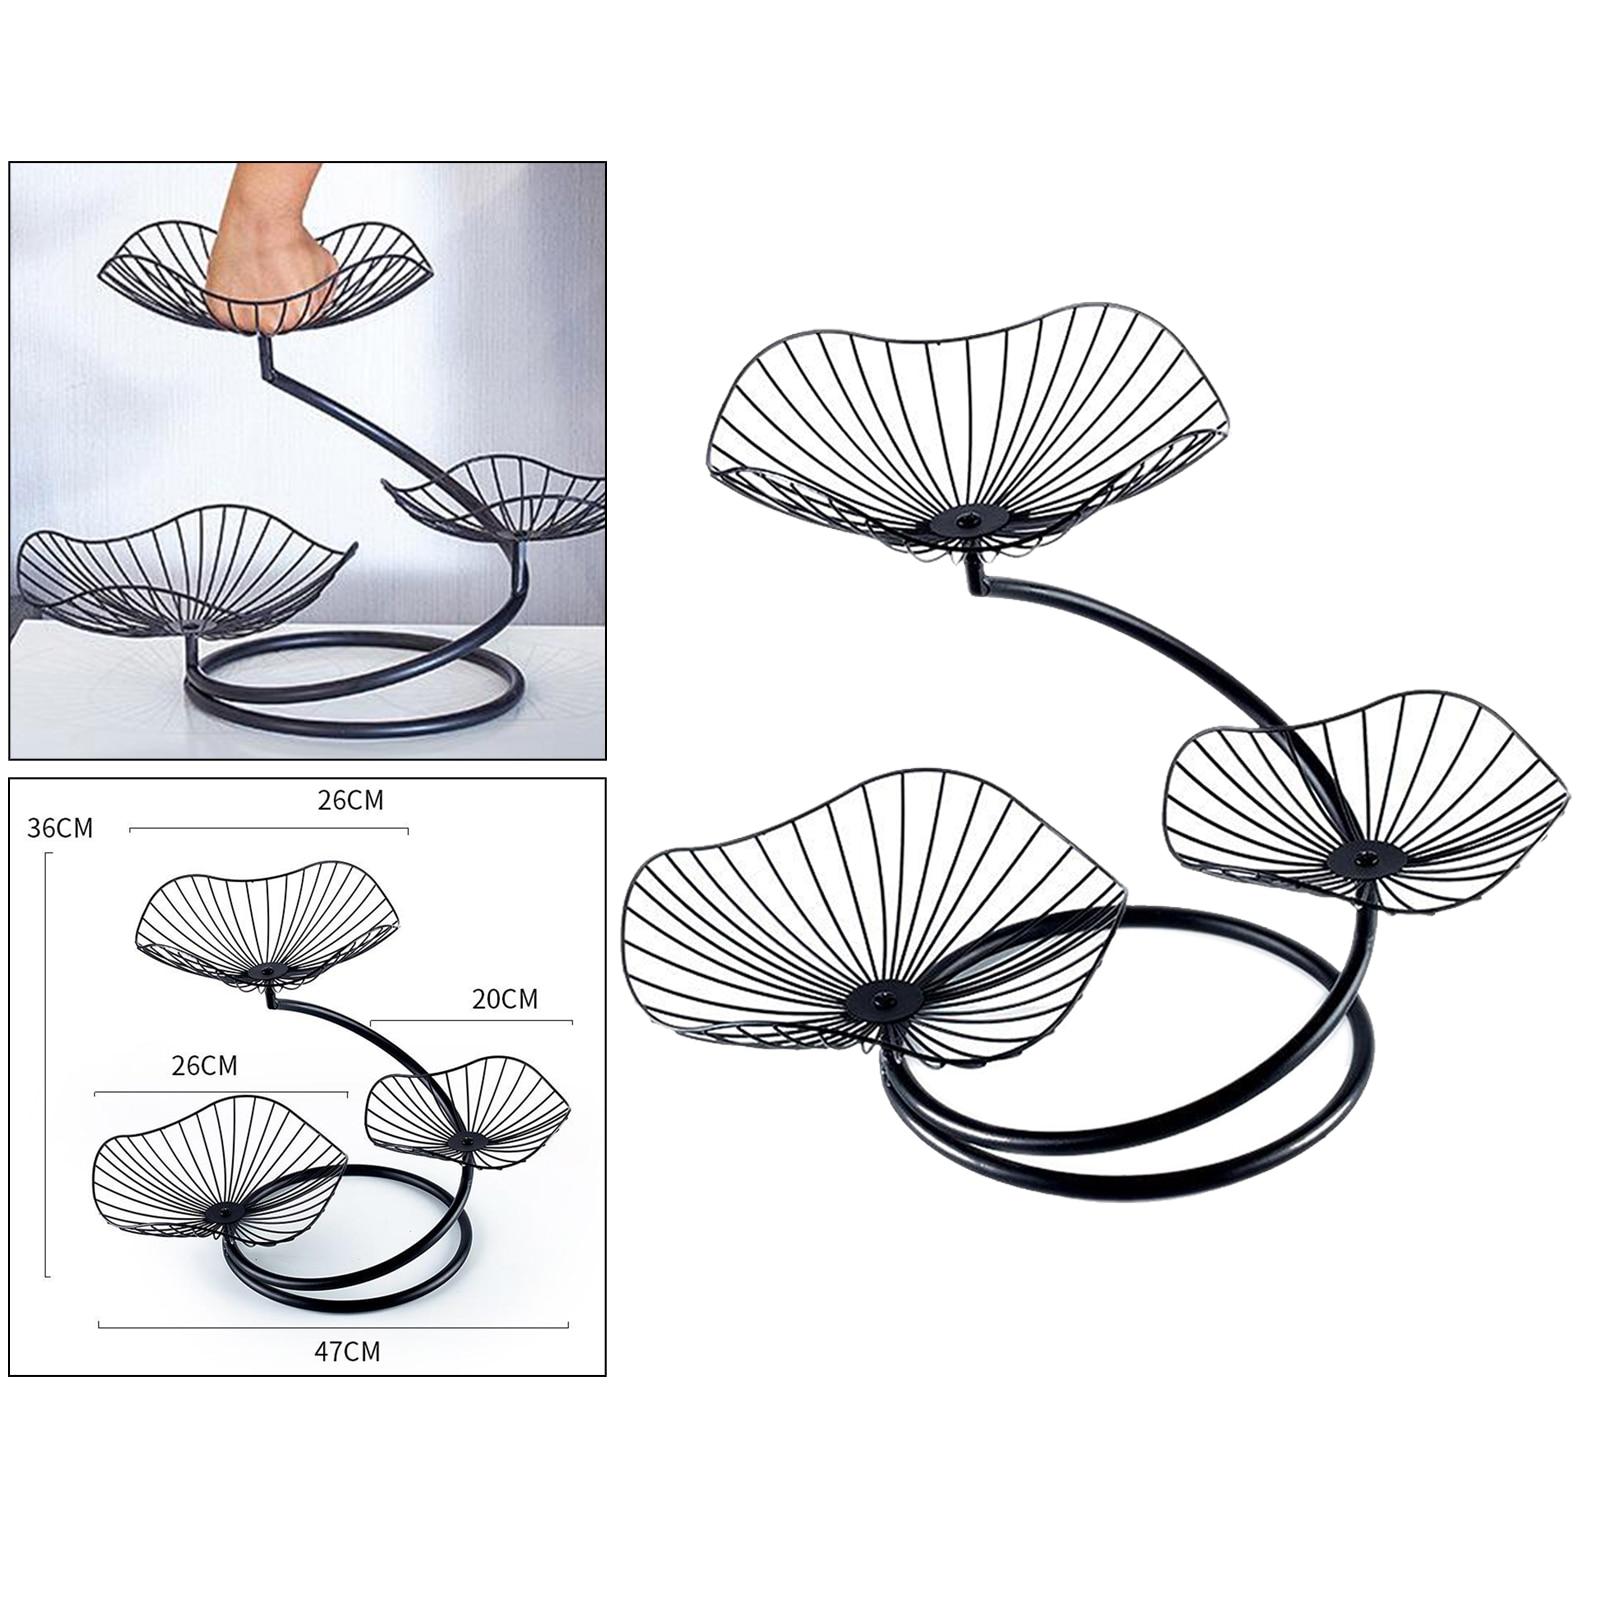 Metal Wire Fruit Basket Minimalist Iron Fruit Bowls Sanck Candy Bread Holder, 3 Tier